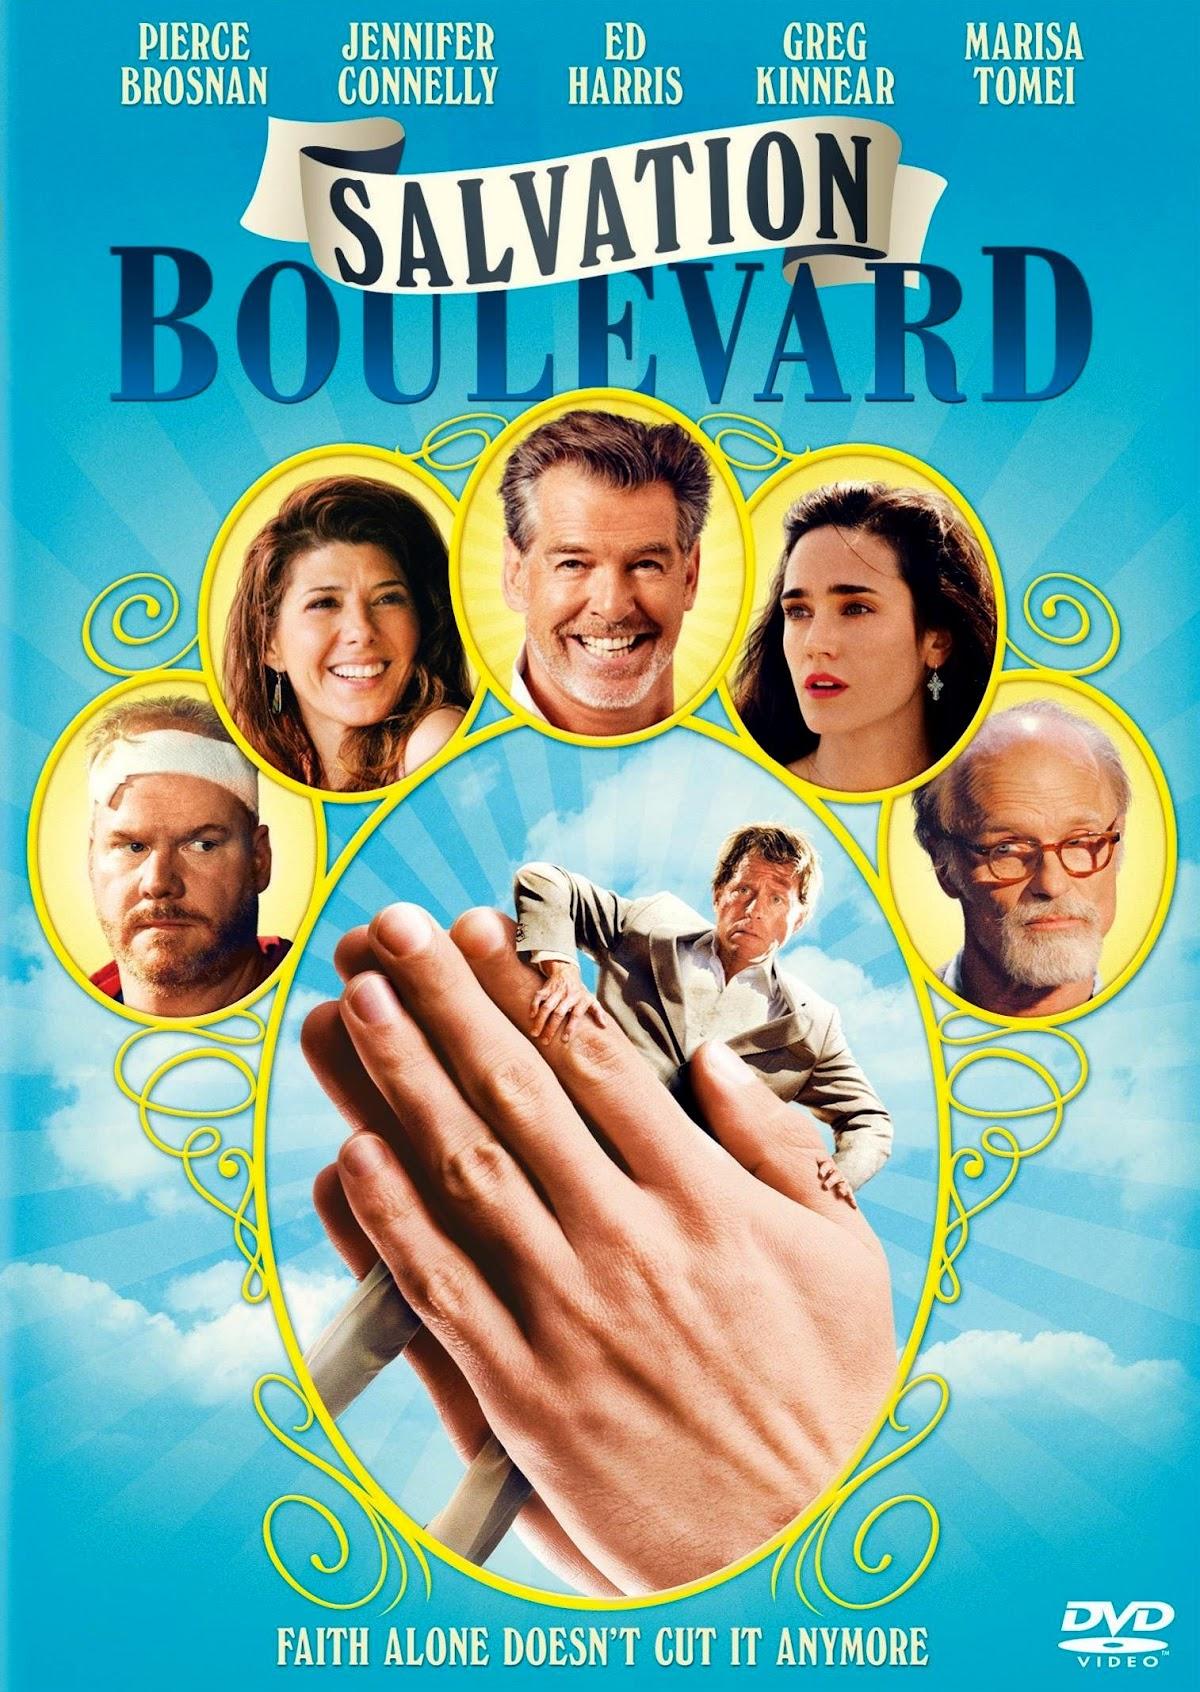 http://2.bp.blogspot.com/-BIg6GASS-Wg/UF4qlj8rYII/AAAAAAAABs8/zsPy8xkb_Hc/s1692/0-salvation-boulevard-dvd-cover-16.jpg